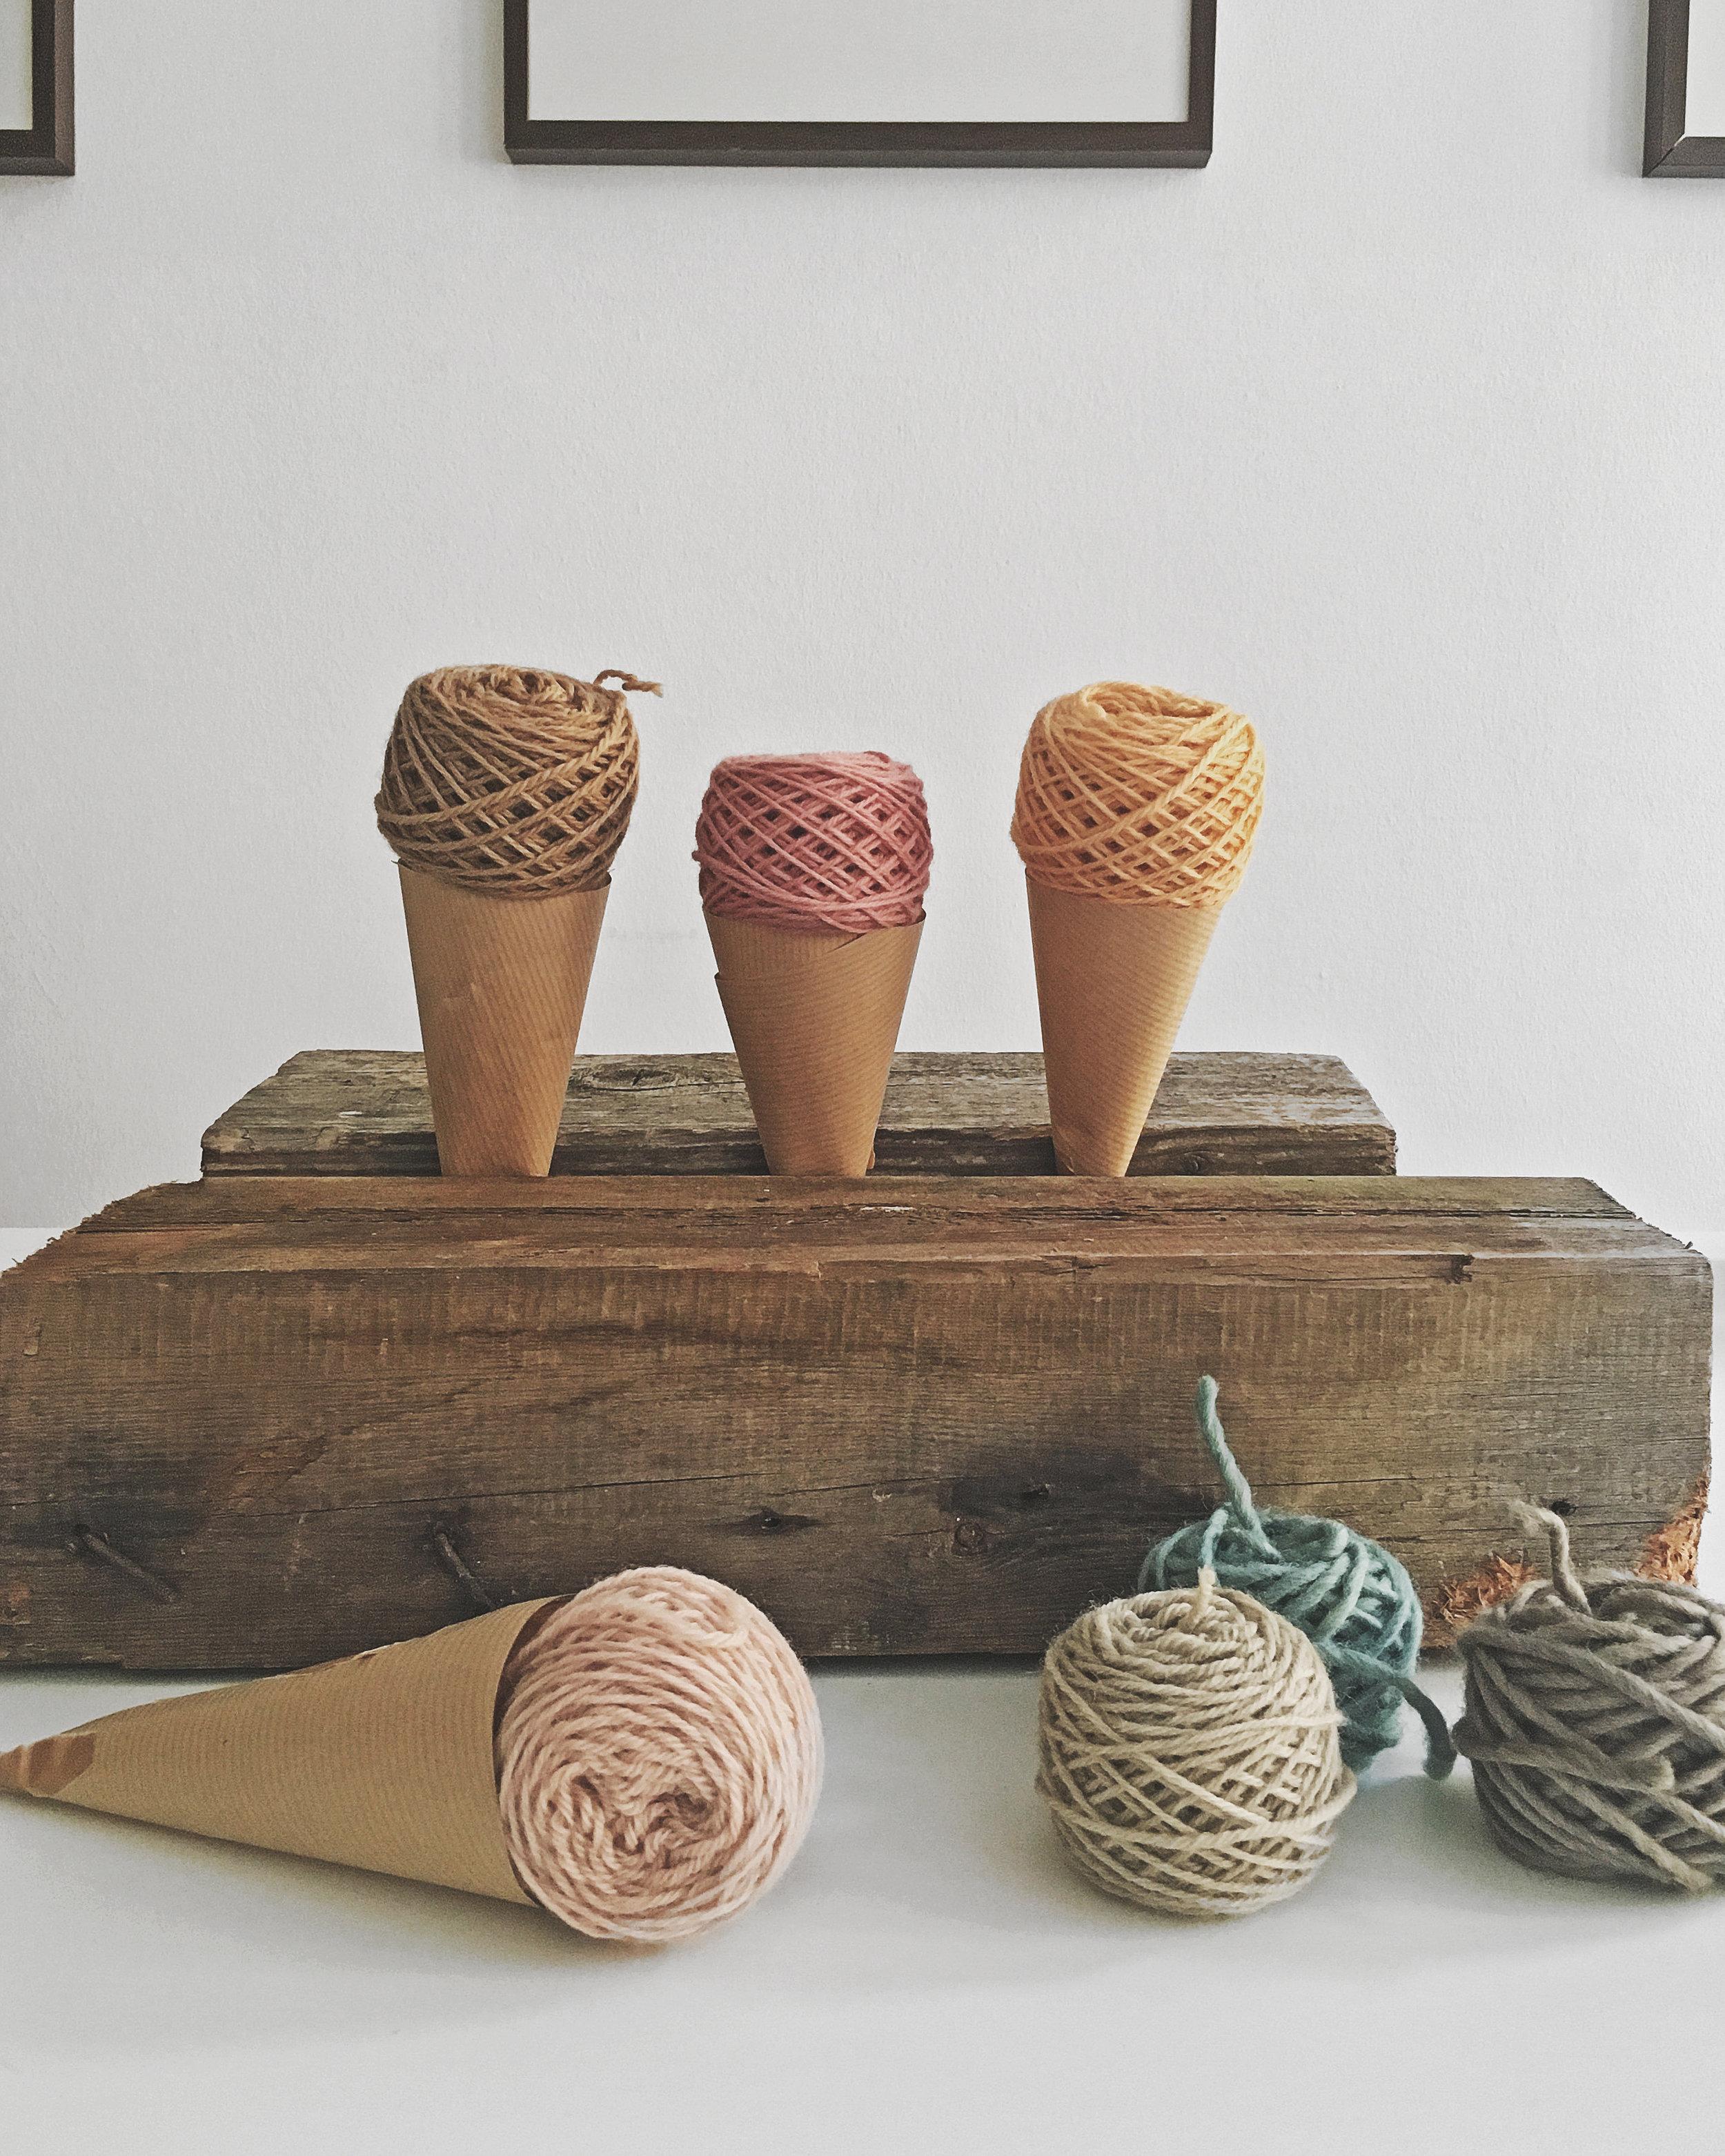 Playing with botanically dyed wool yarn sets